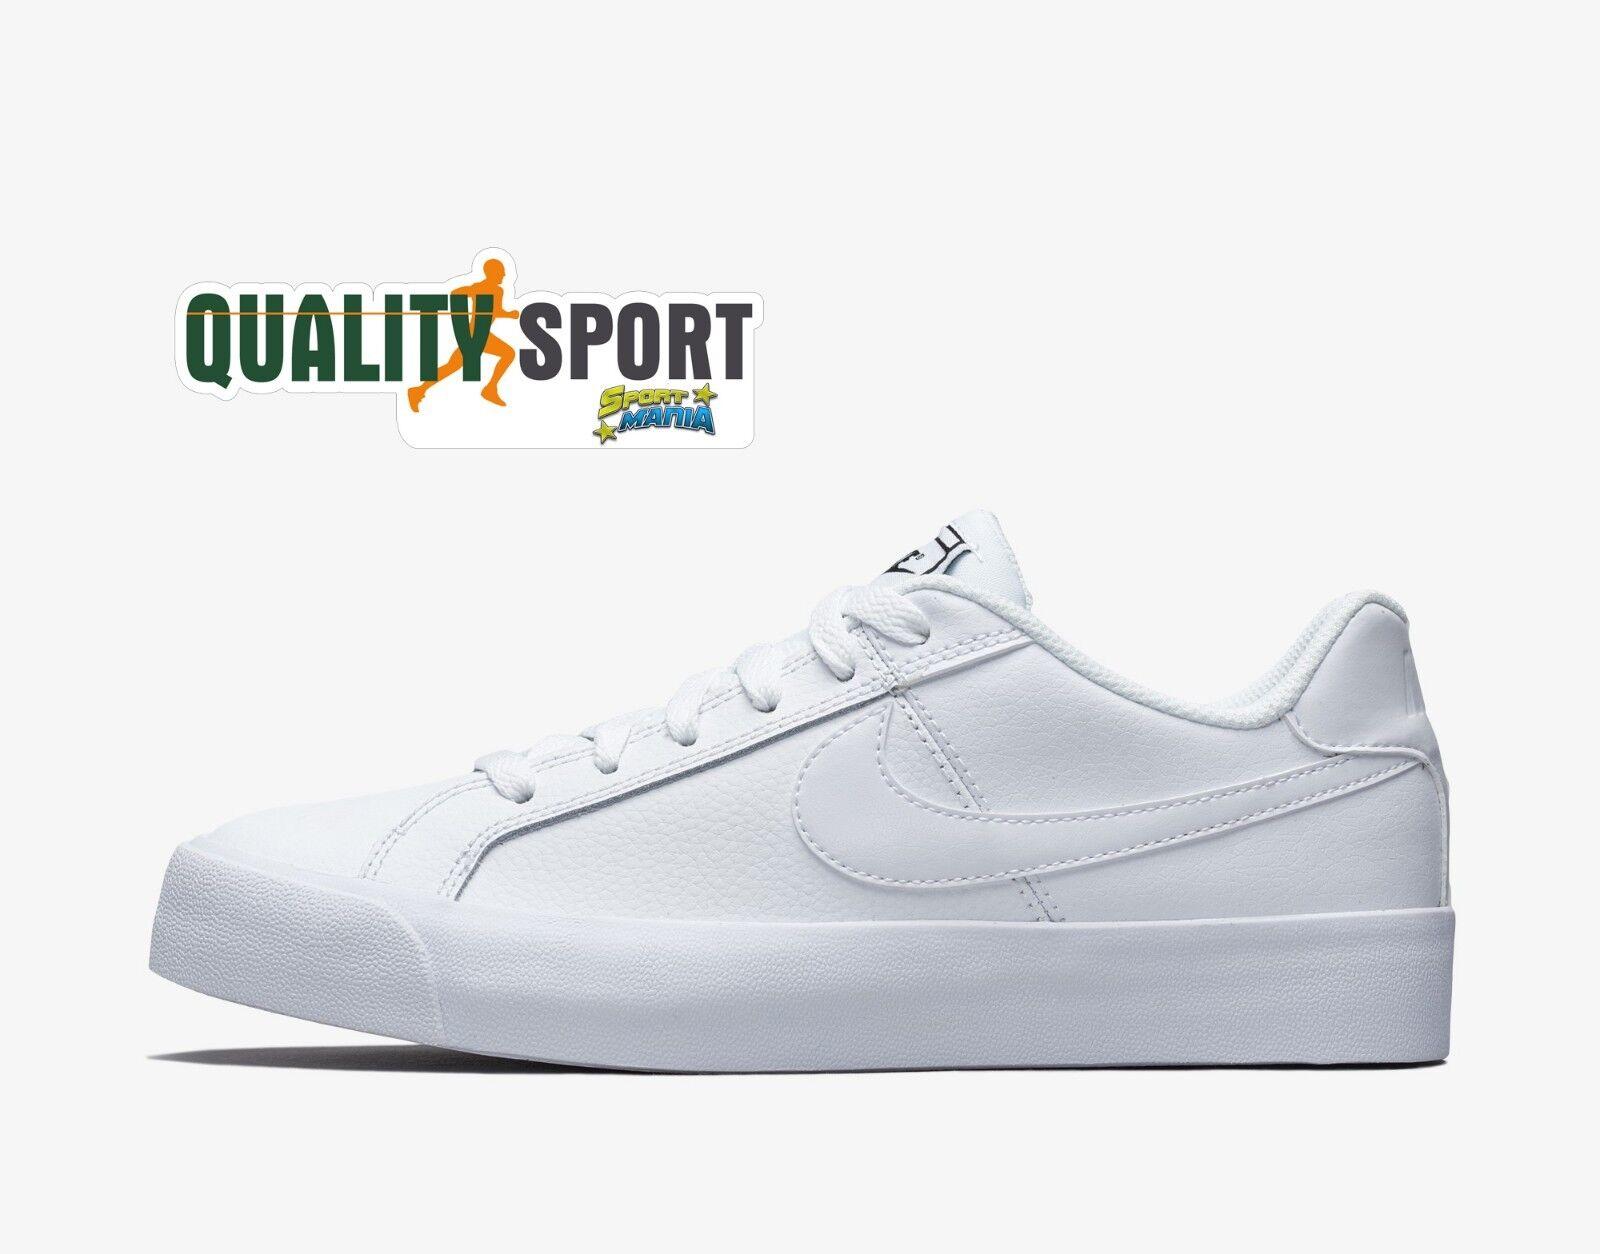 Nike Court Royale AC Bianco zapatos mujer 102 Ragazzo zapatillas AO2810 102 mujer 0c6b80